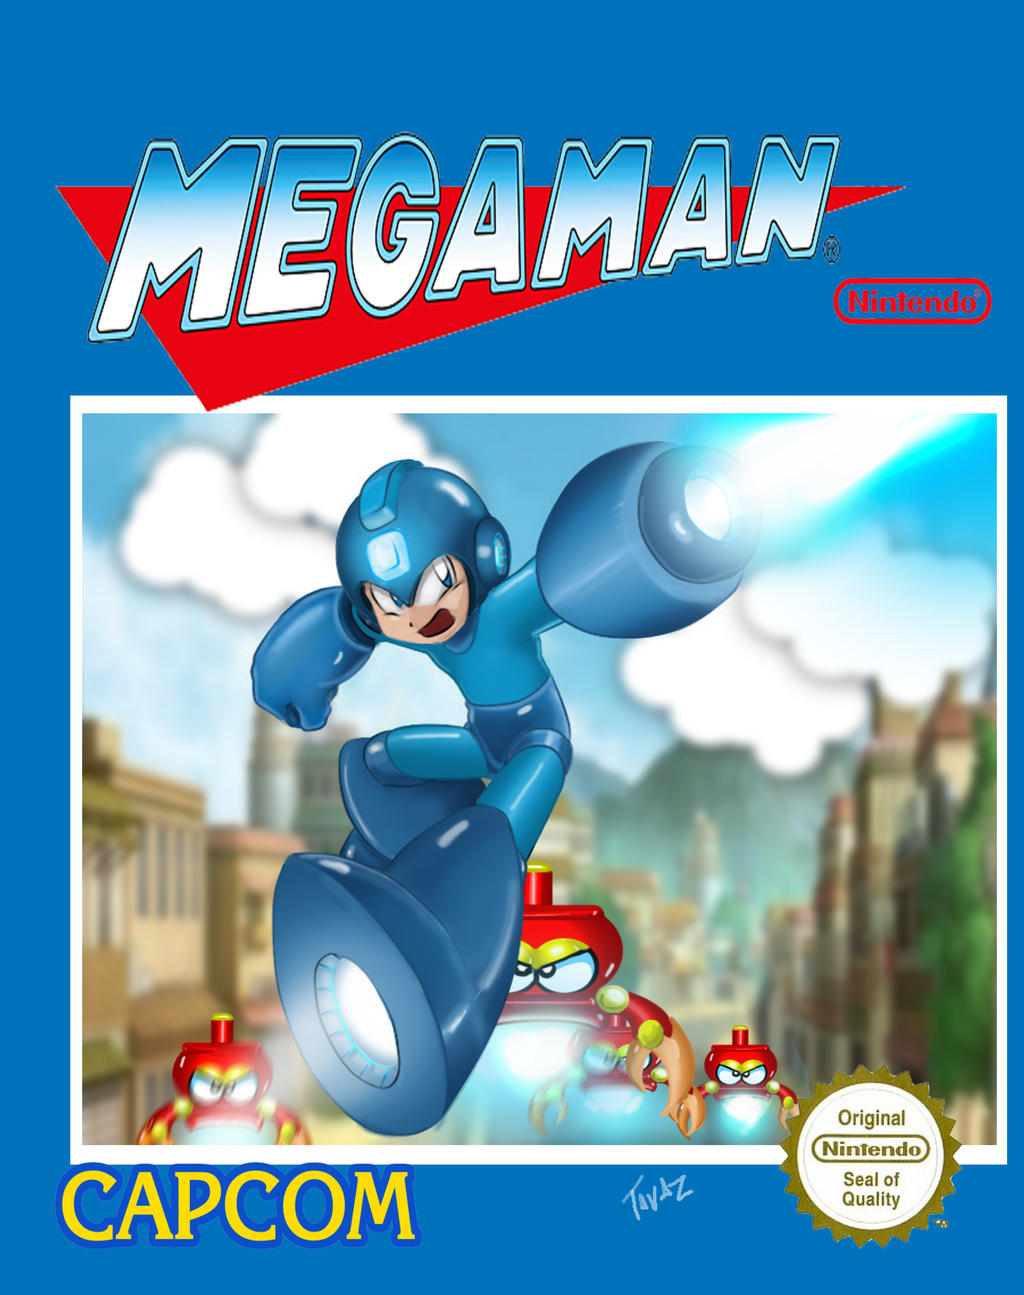 Megaman cover ness by etavitas on deviantart for Megaman 9 portada